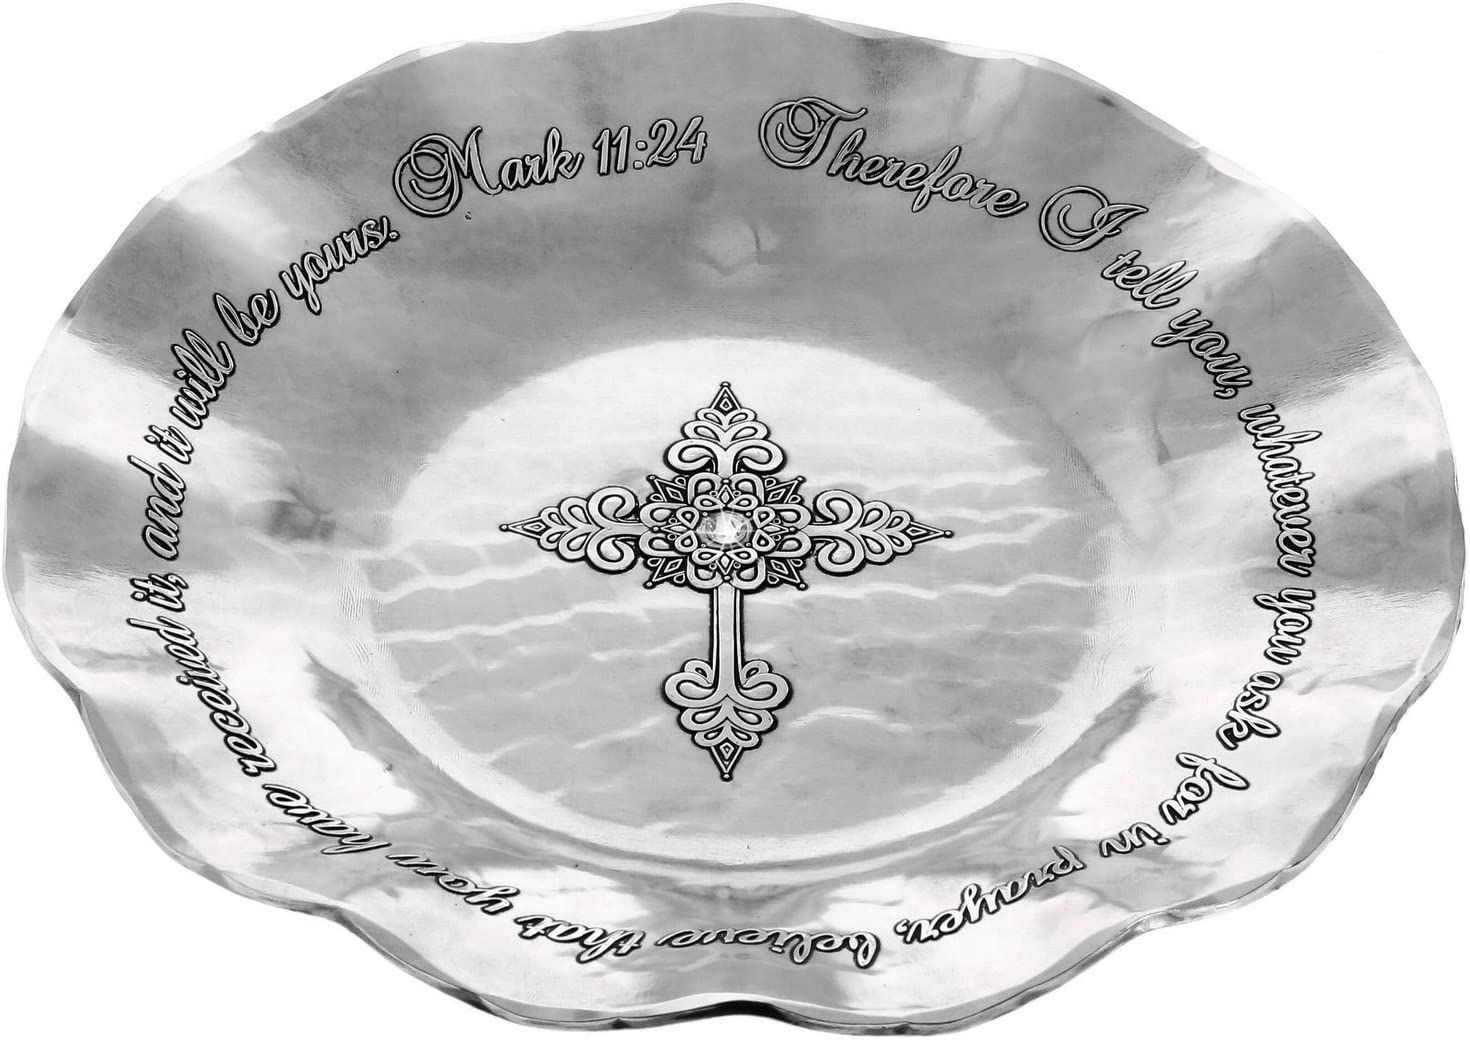 35% OFF Wendell August The Prayer Bowl Aluminum Popular brand in the world